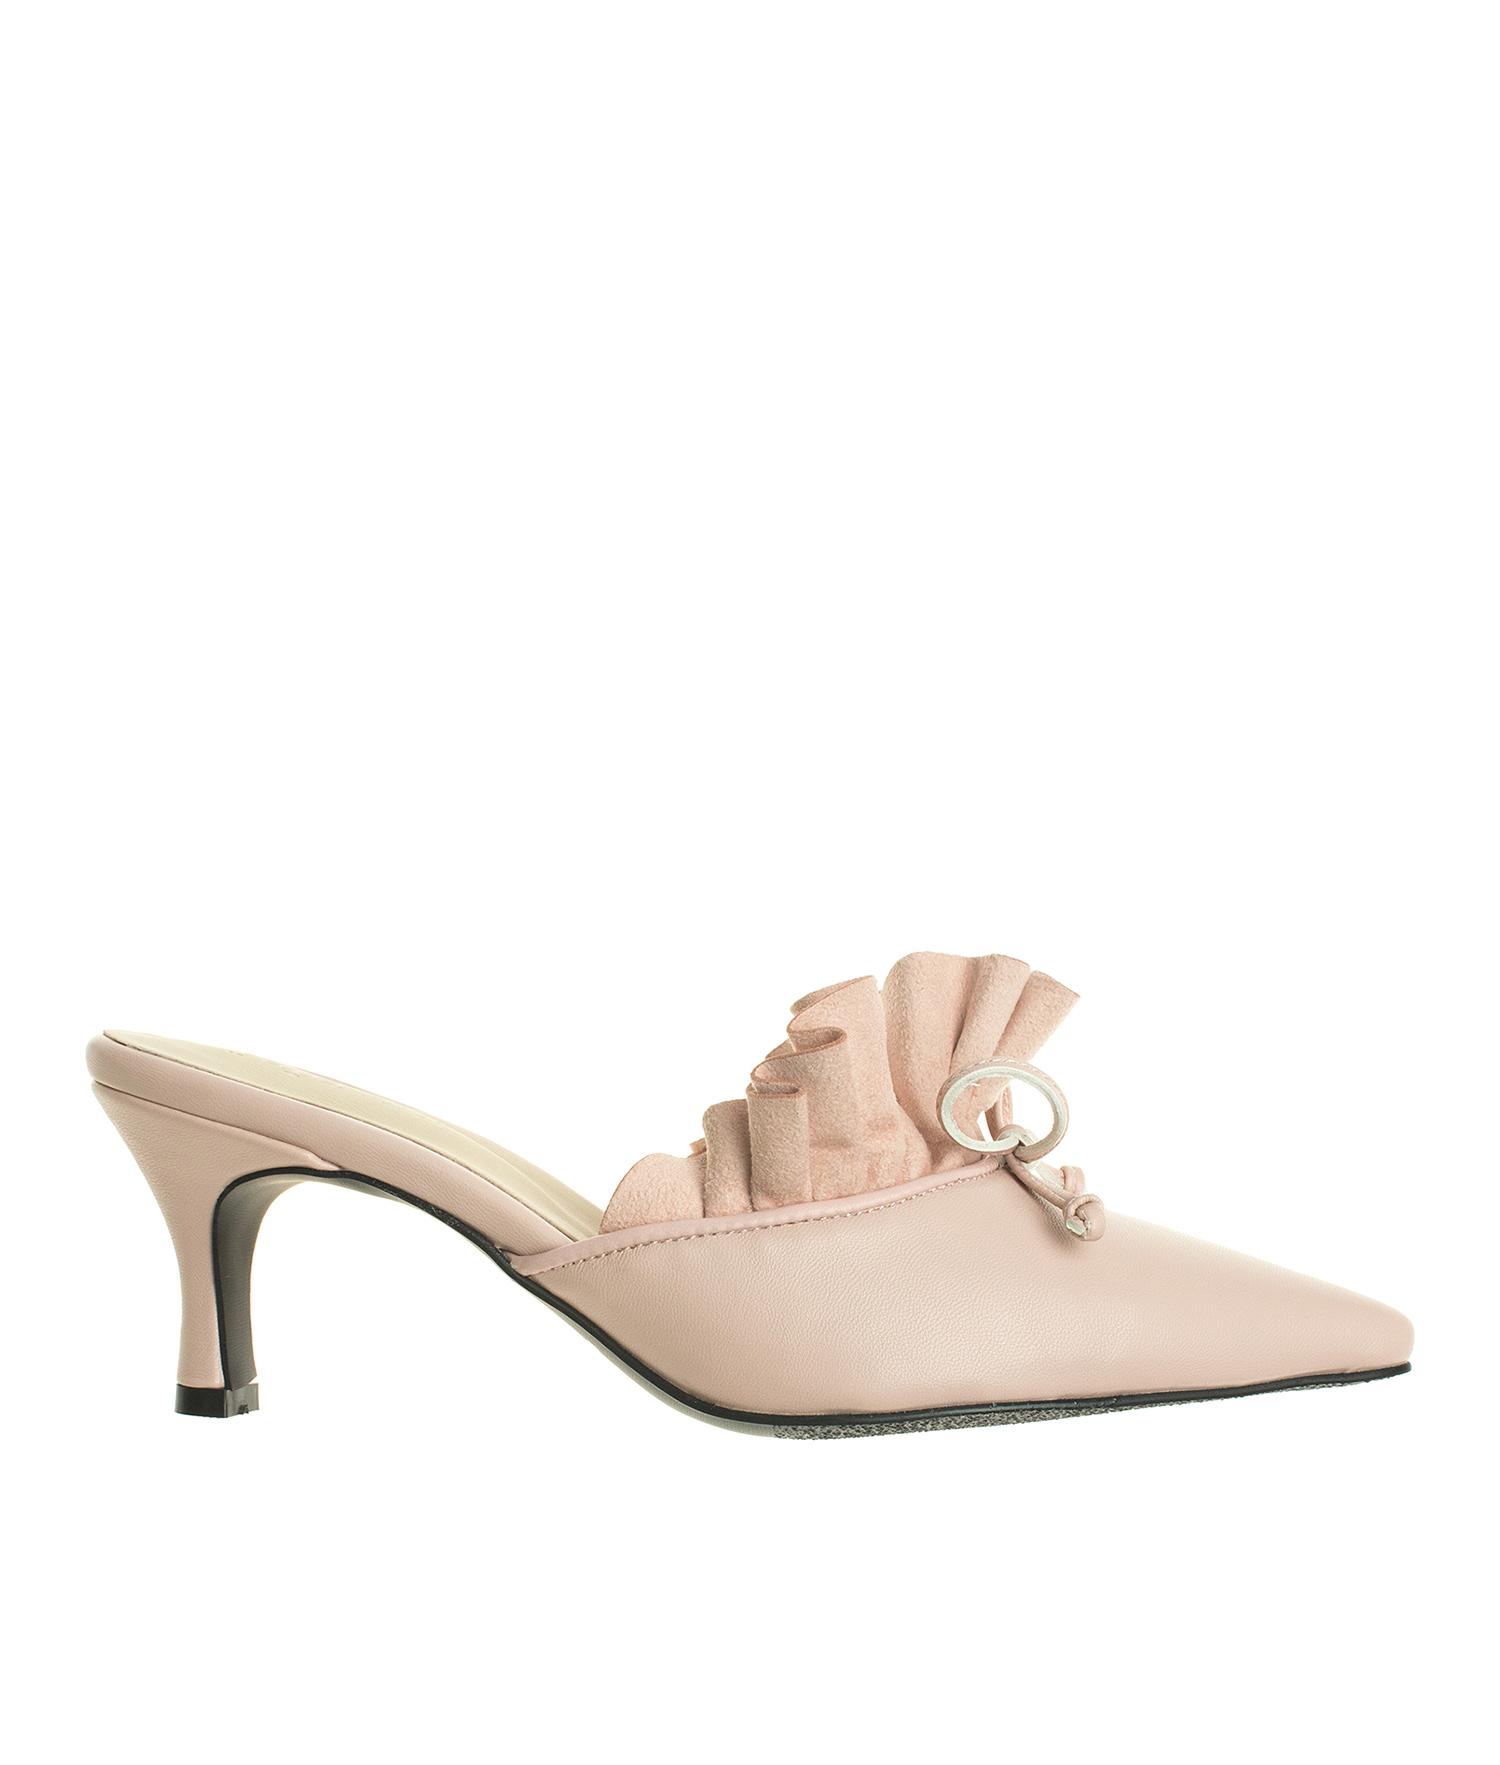 5be945b9bf AnnaKastle Womens Kitten Heel Ruffled Mule Dress Shoes Light Pink